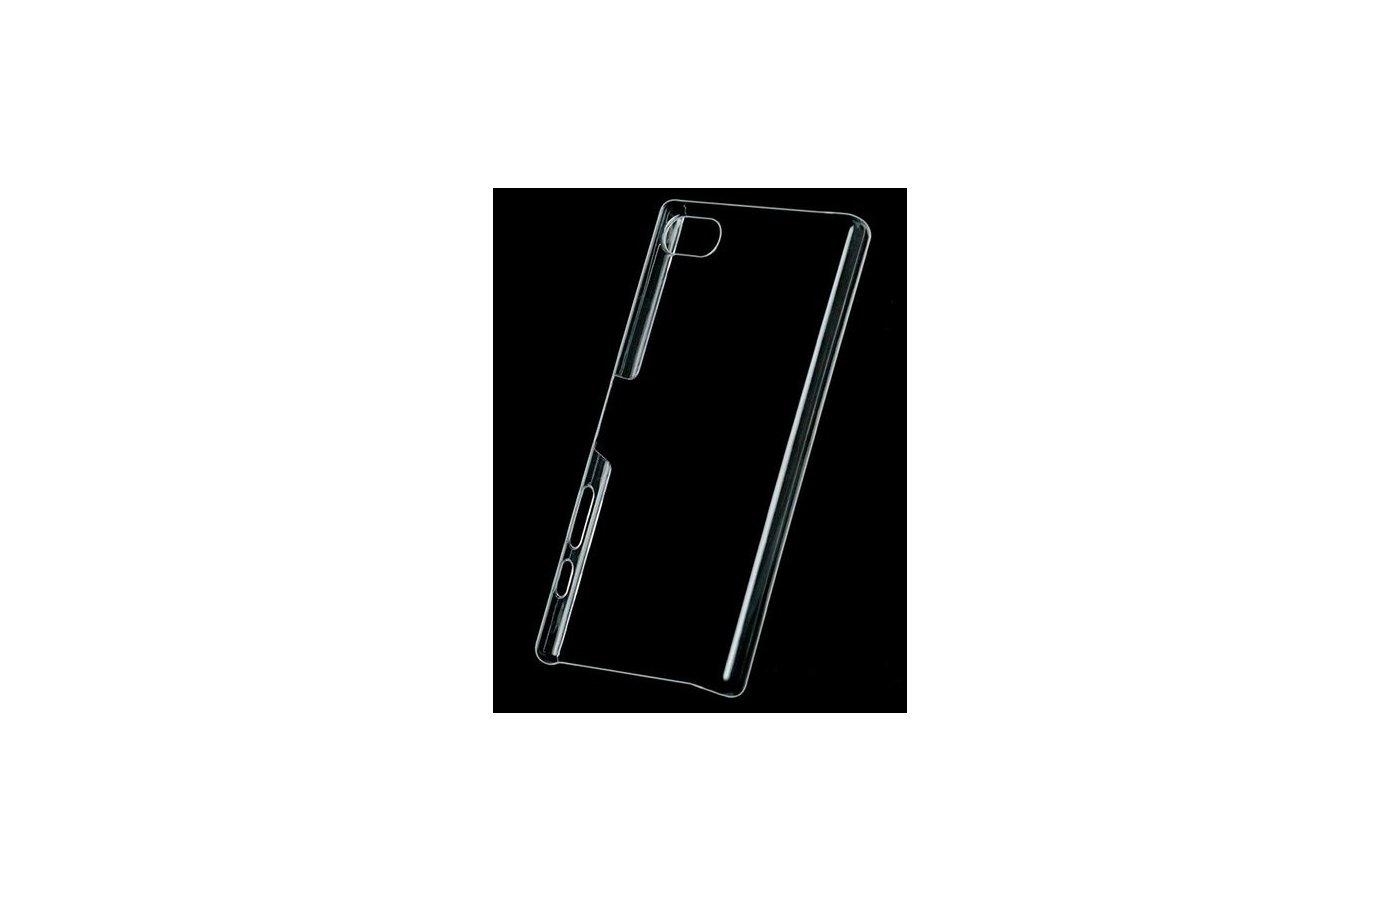 Чехол iBox Crystal для Sony Xperia Z5 Compact прозрачный